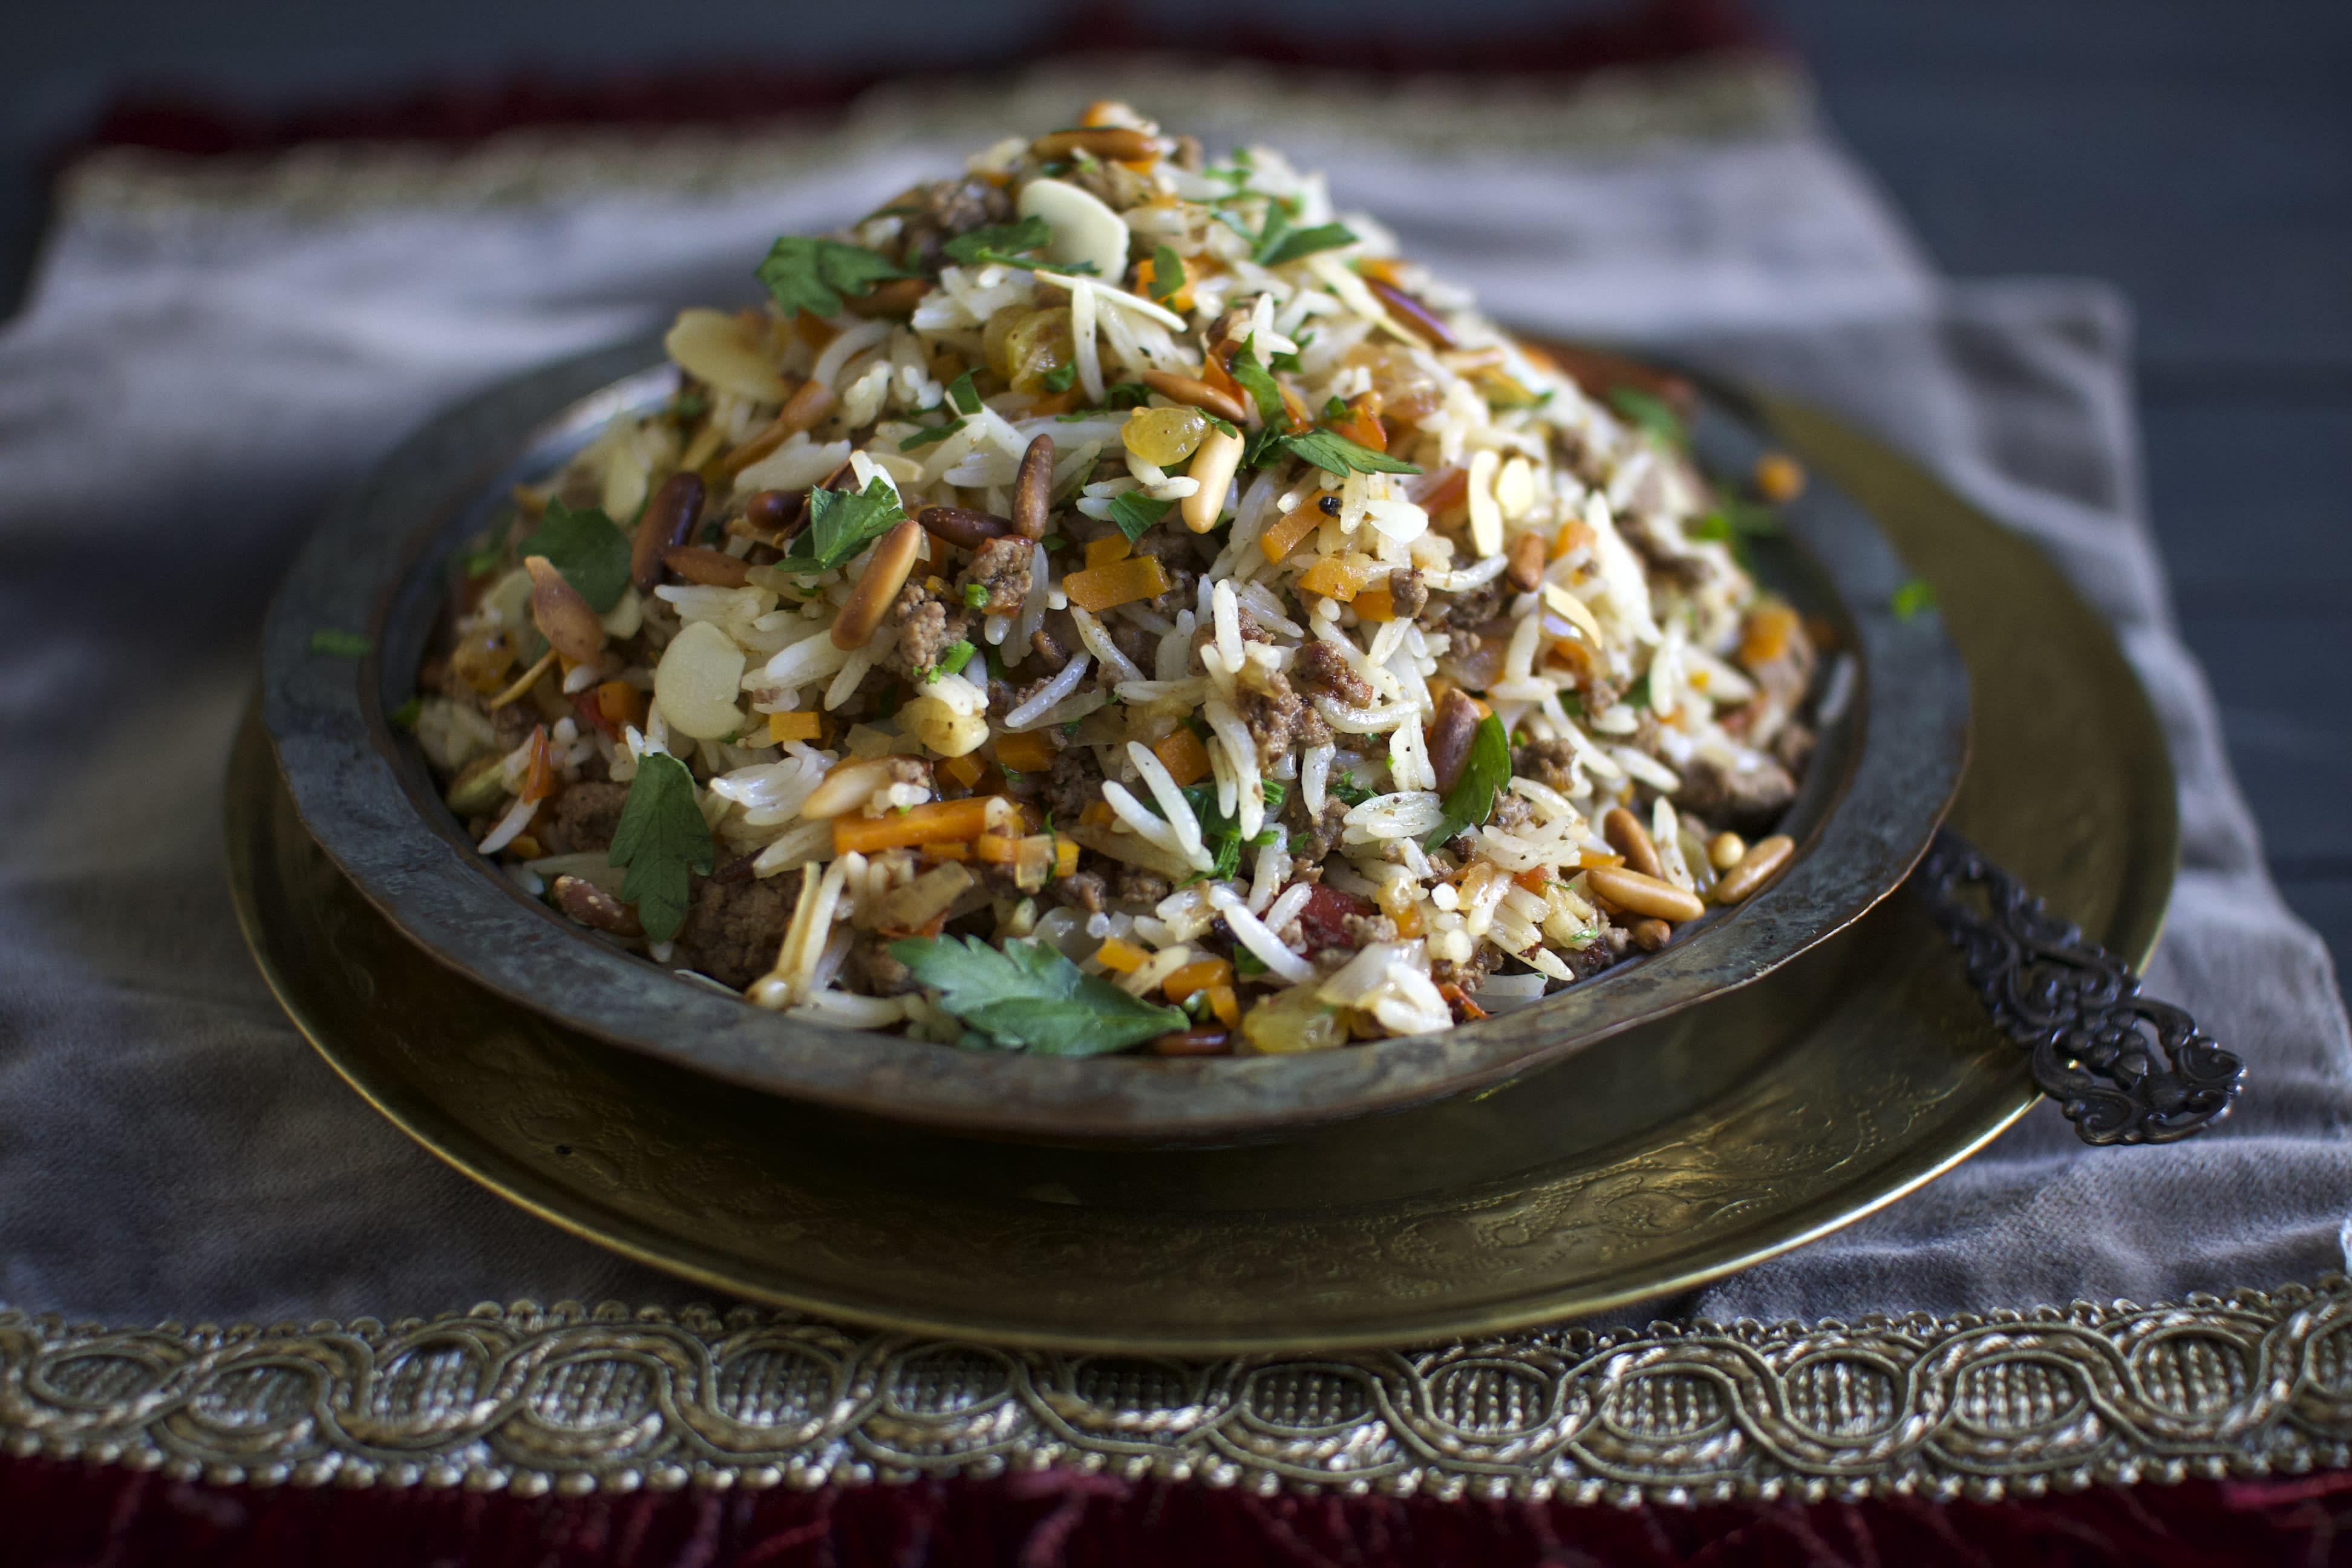 Lebanese Hashweh Beef and Rice One-Pan with Pine Nuts and Yogurt